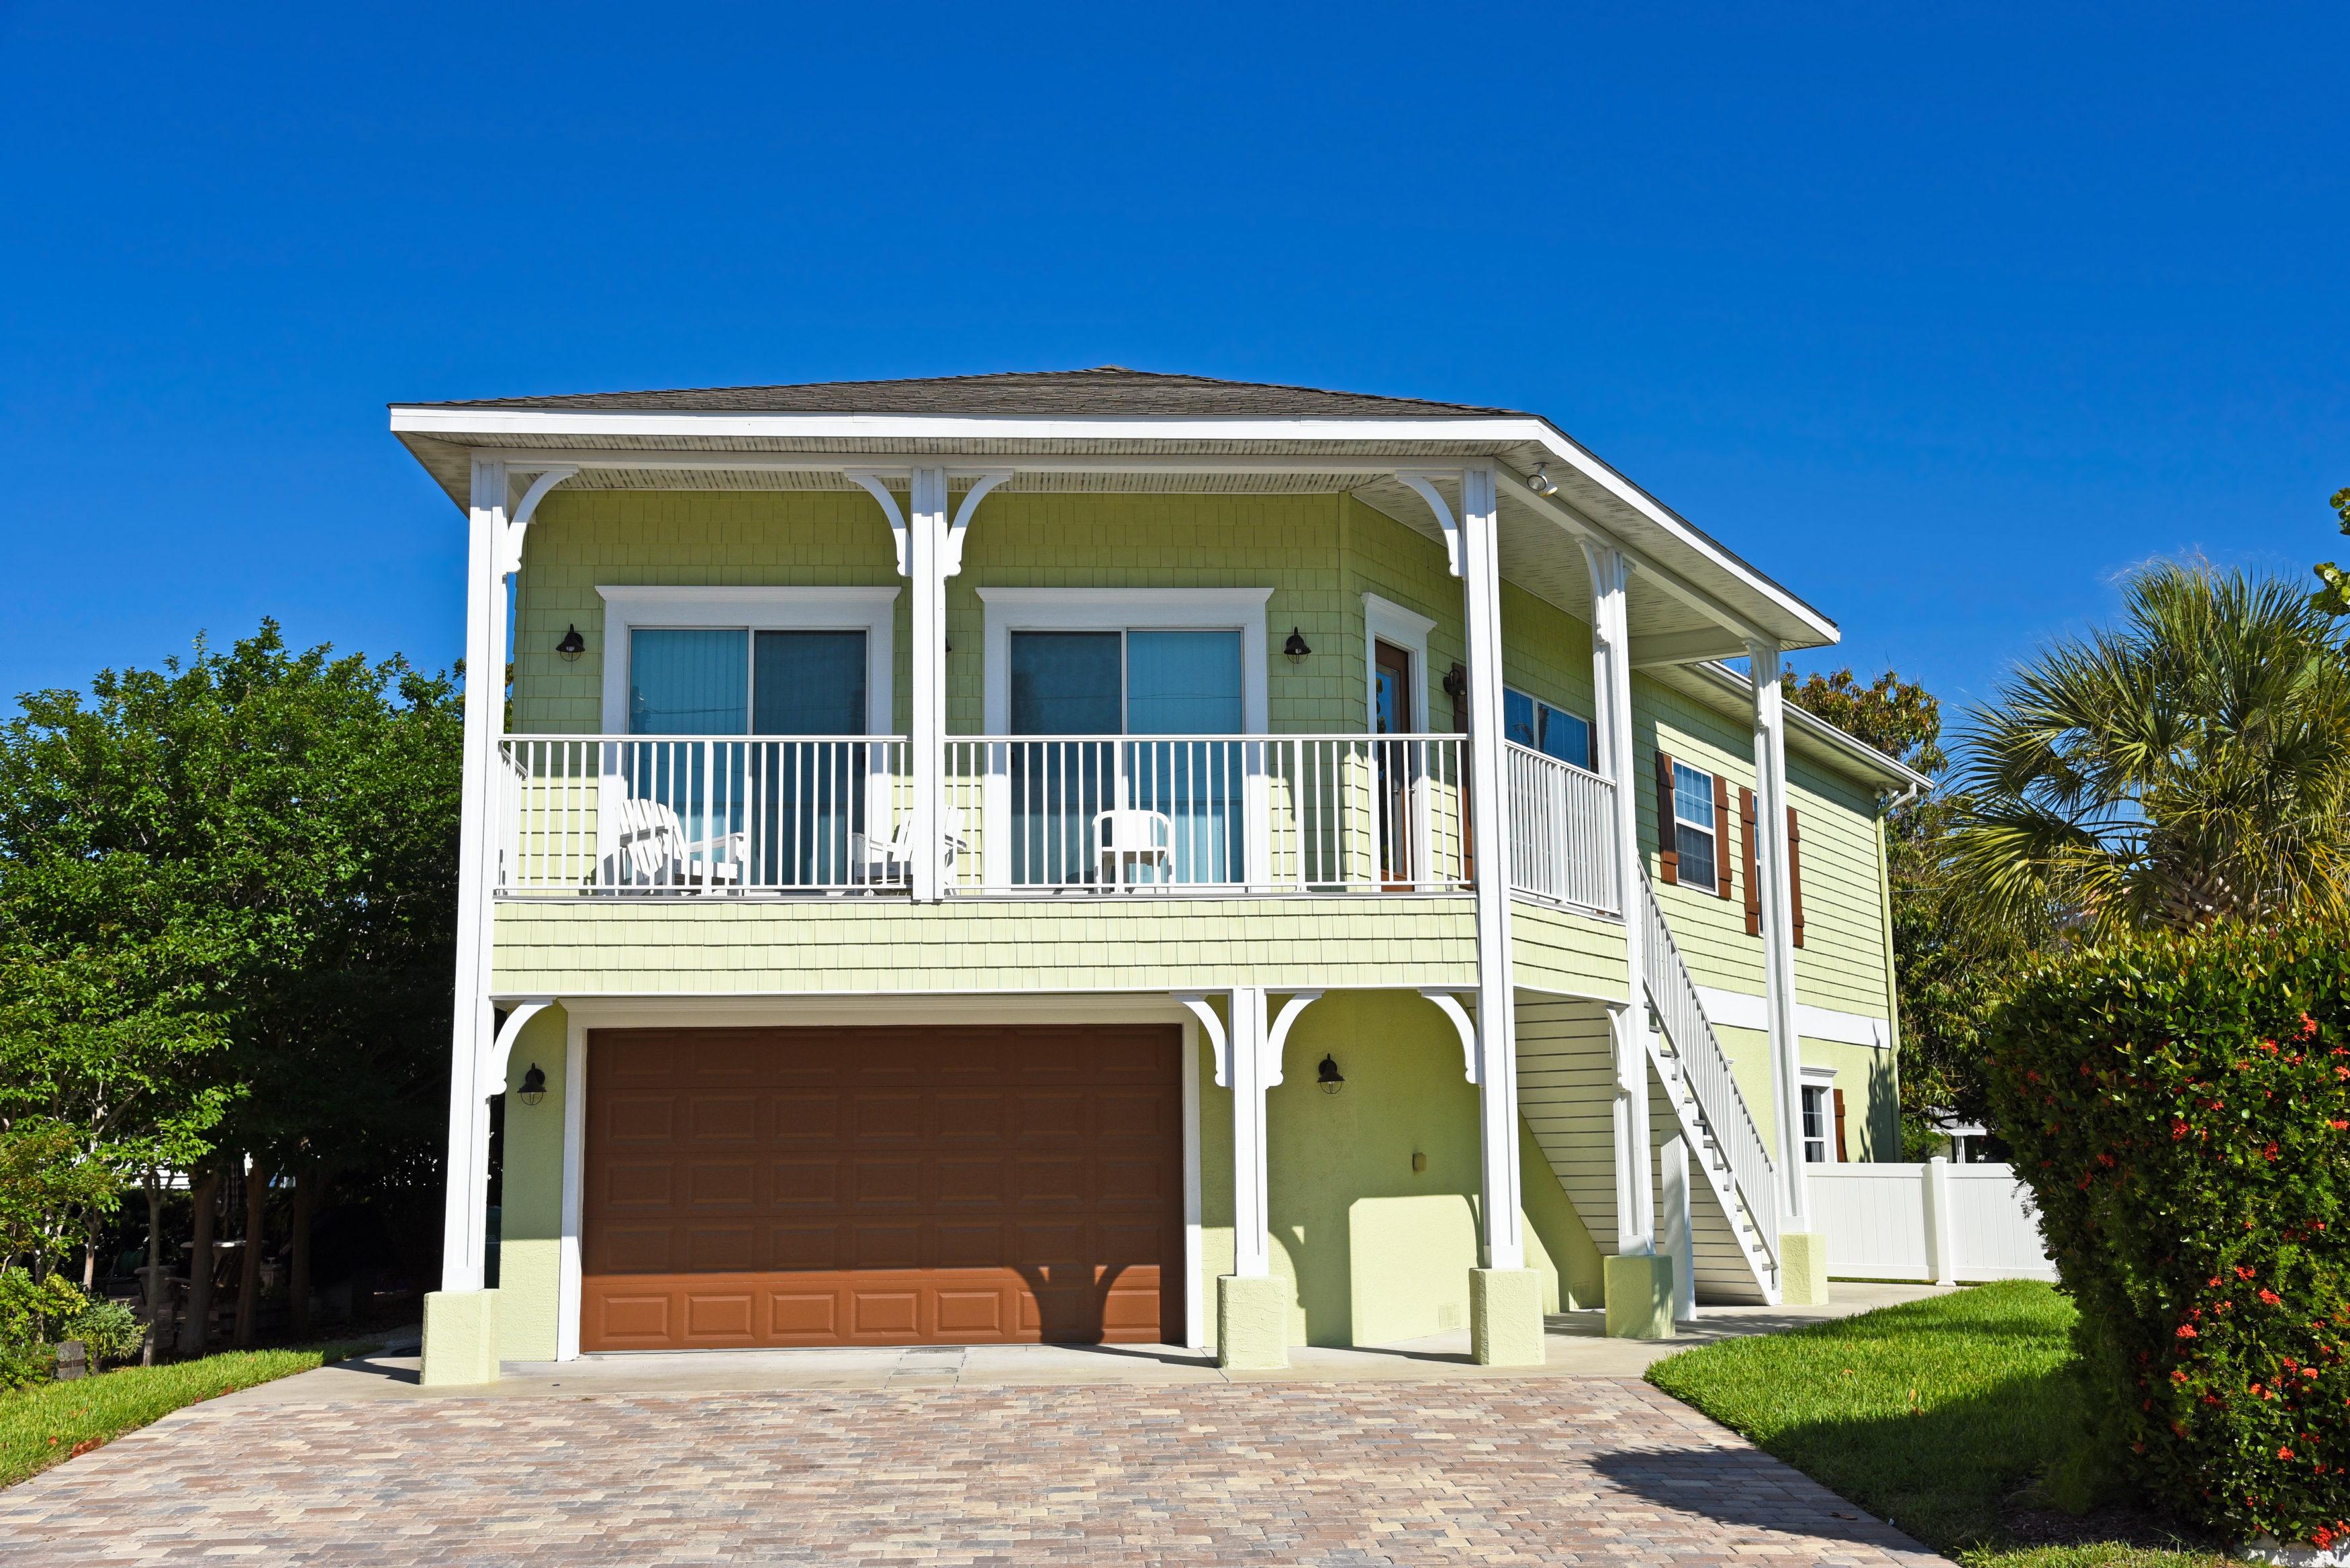 short-term-rentals-01.03-3500x2336.jpg